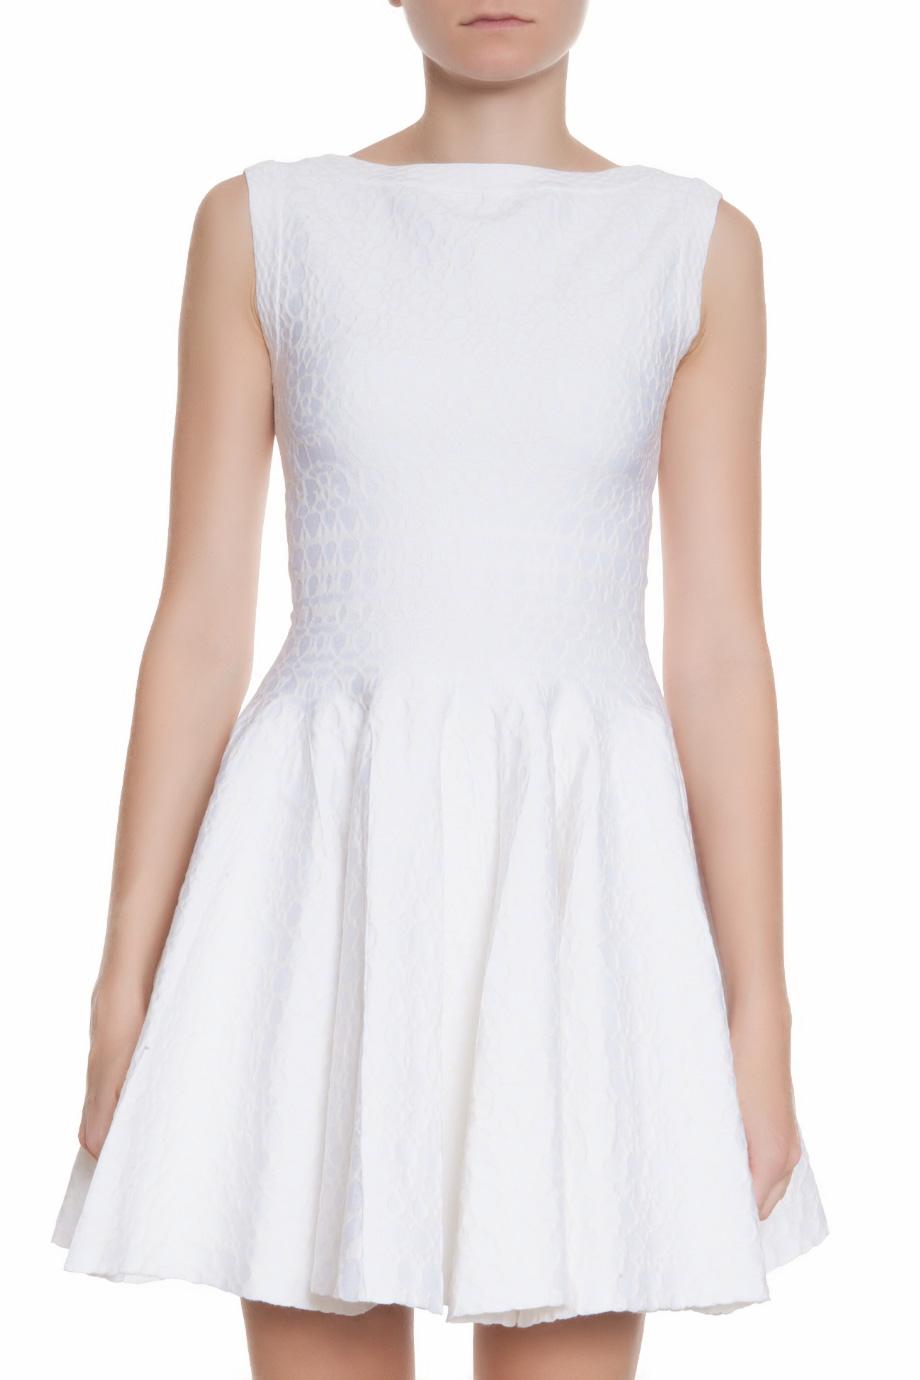 Alaïa Sleeveless Cosmos Dress in White